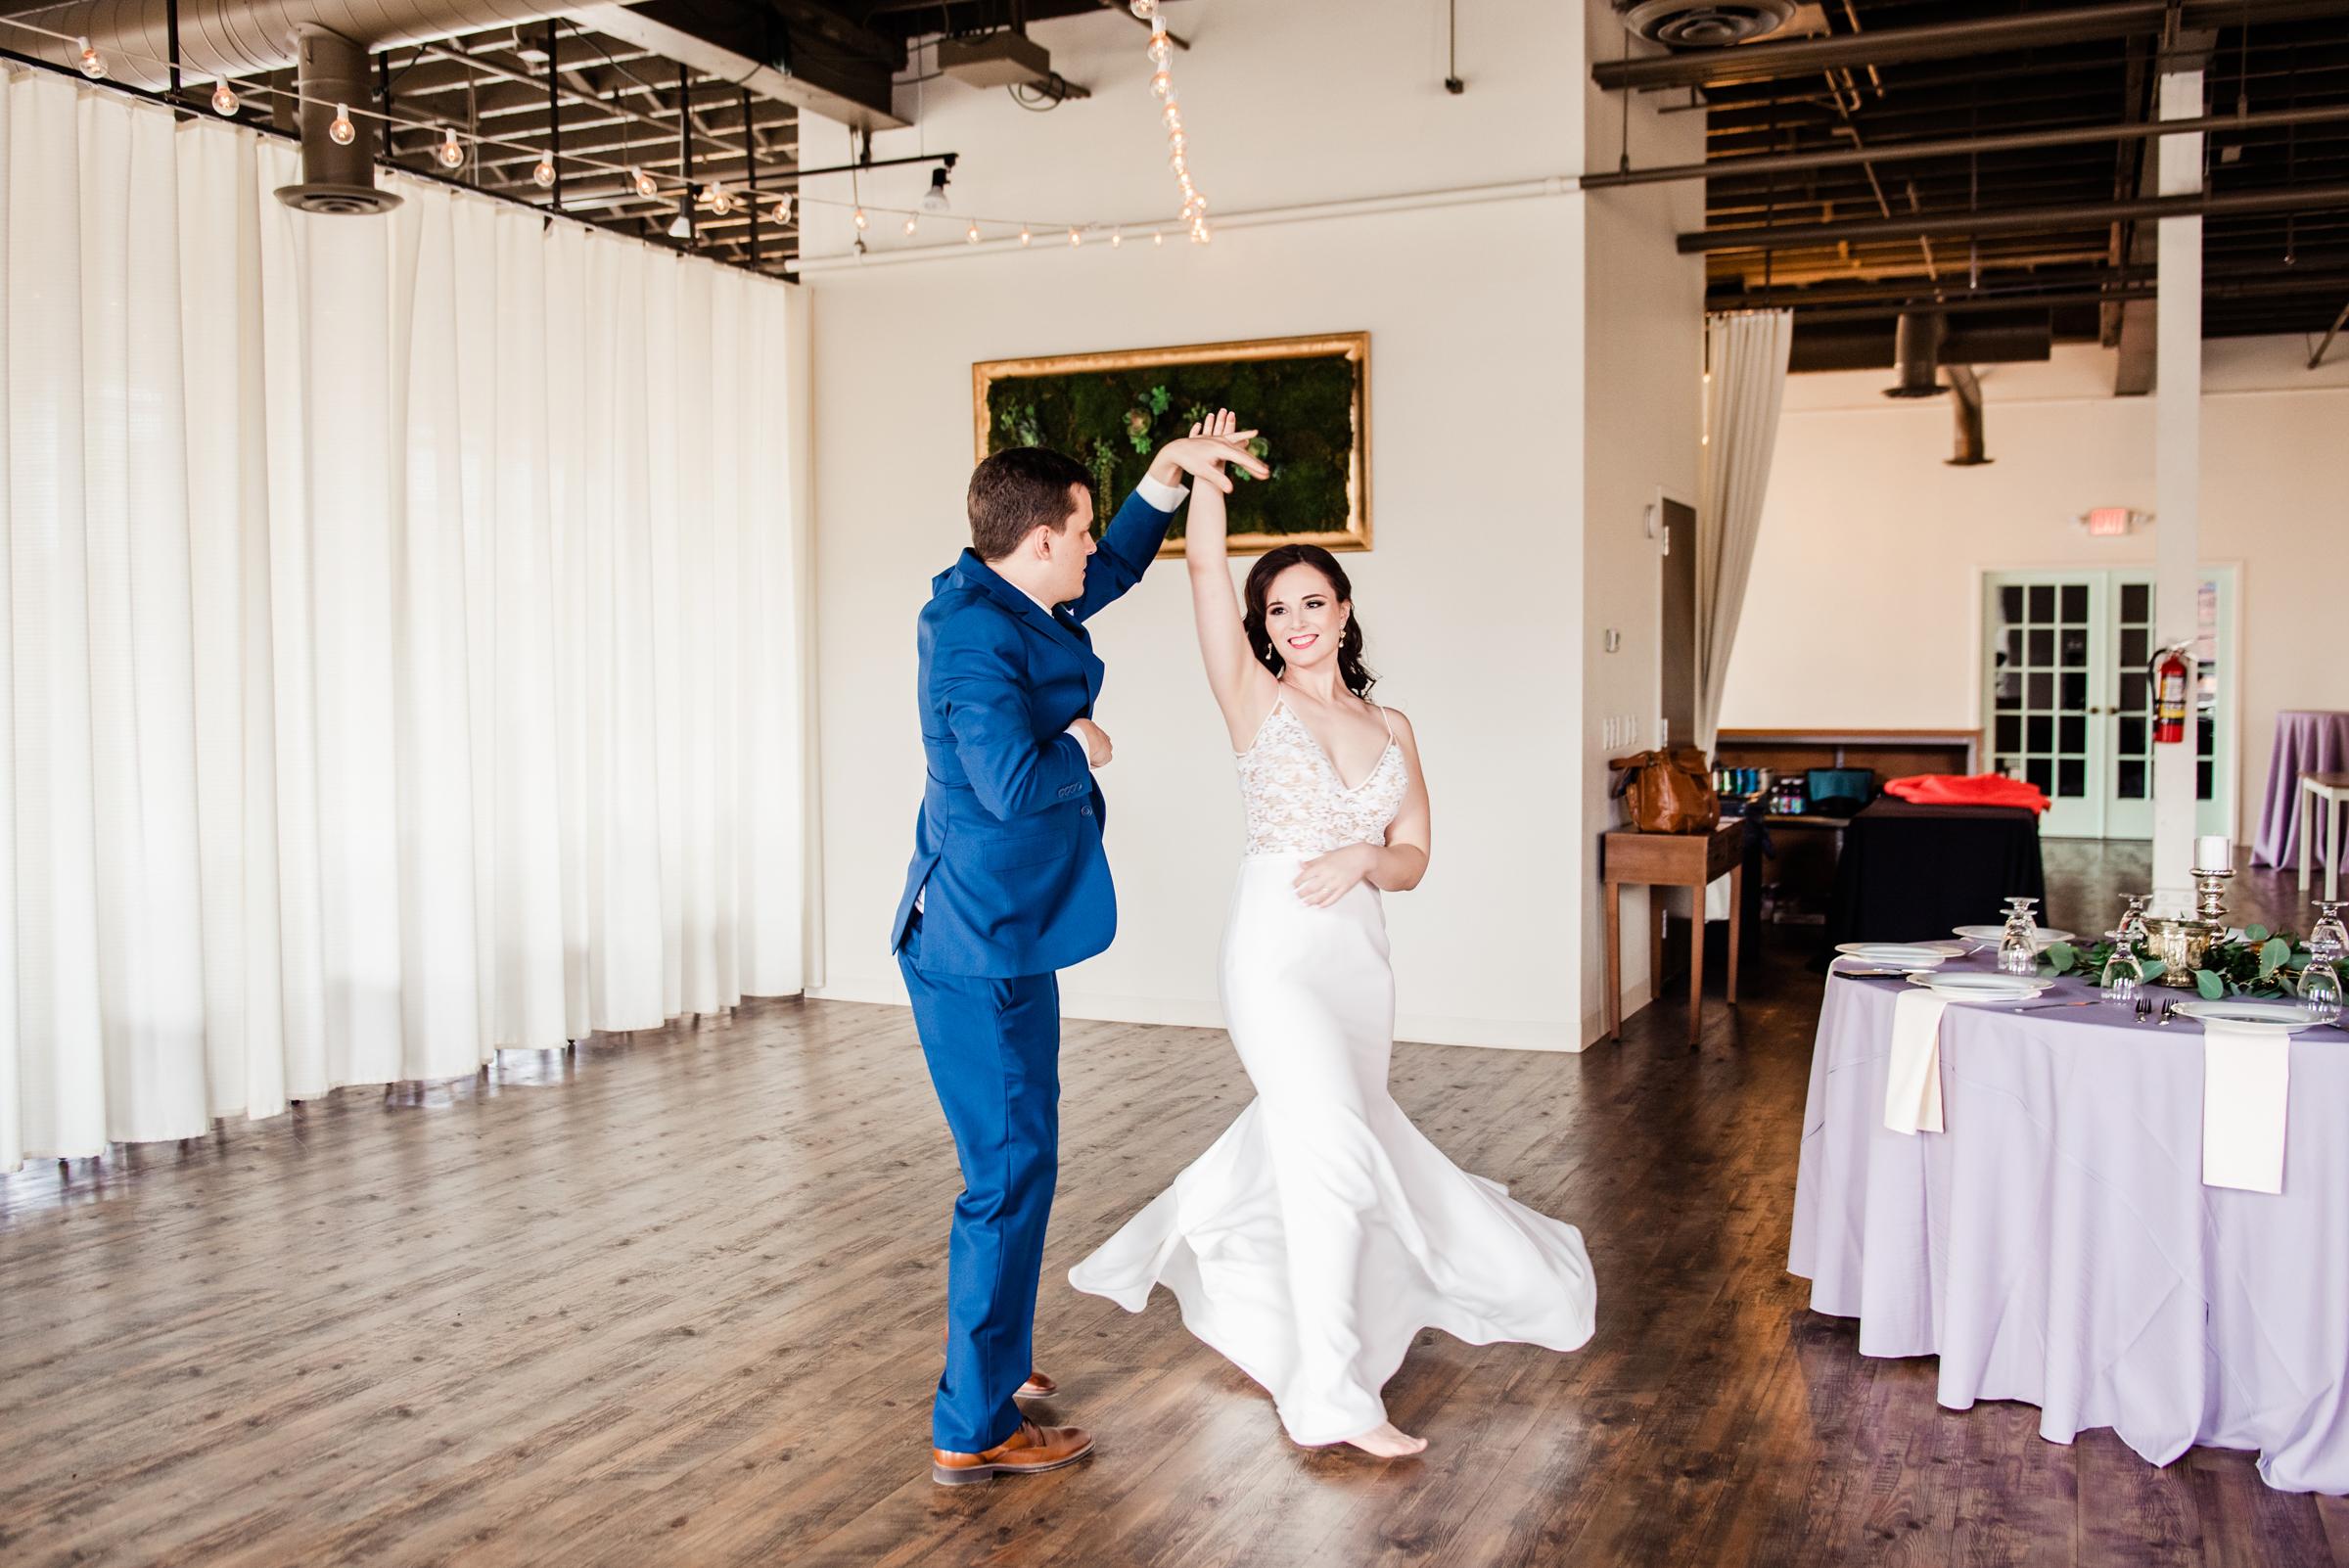 The_Arbor_LoftRochester_Wedding_JILL_STUDIO_Rochester_NY_Photographer_151426.jpg